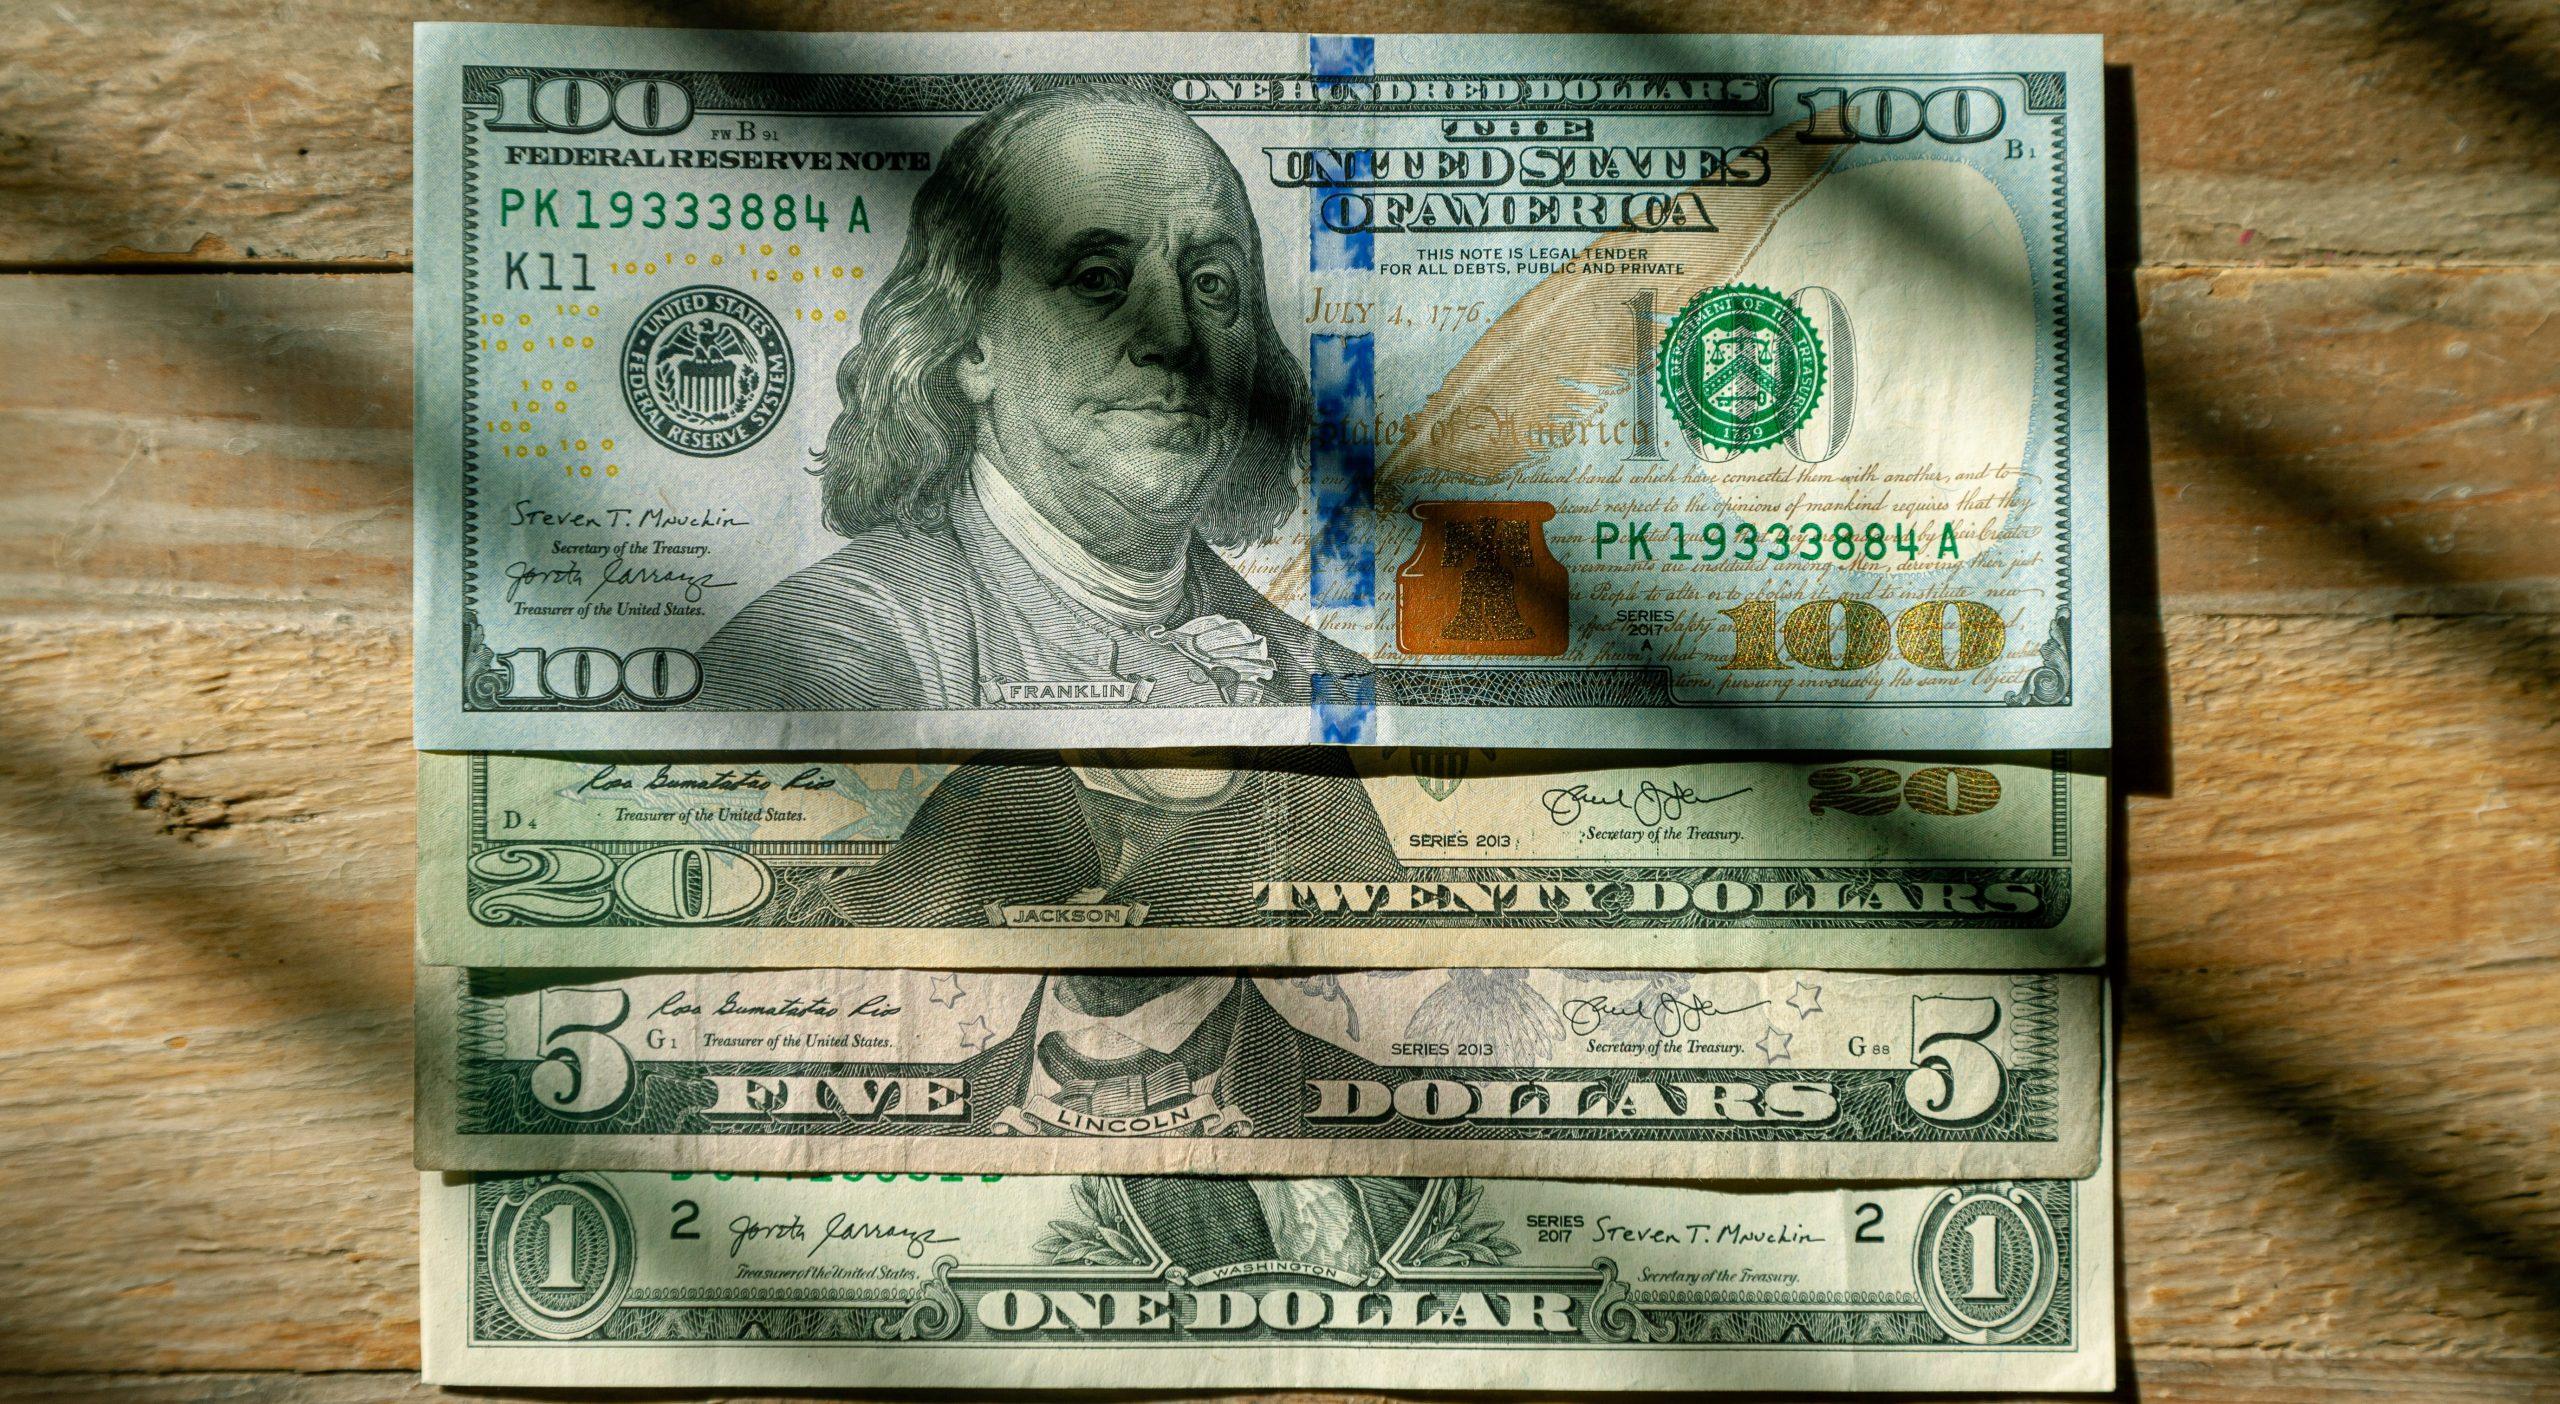 FBAR Benjamin Franklin taxes